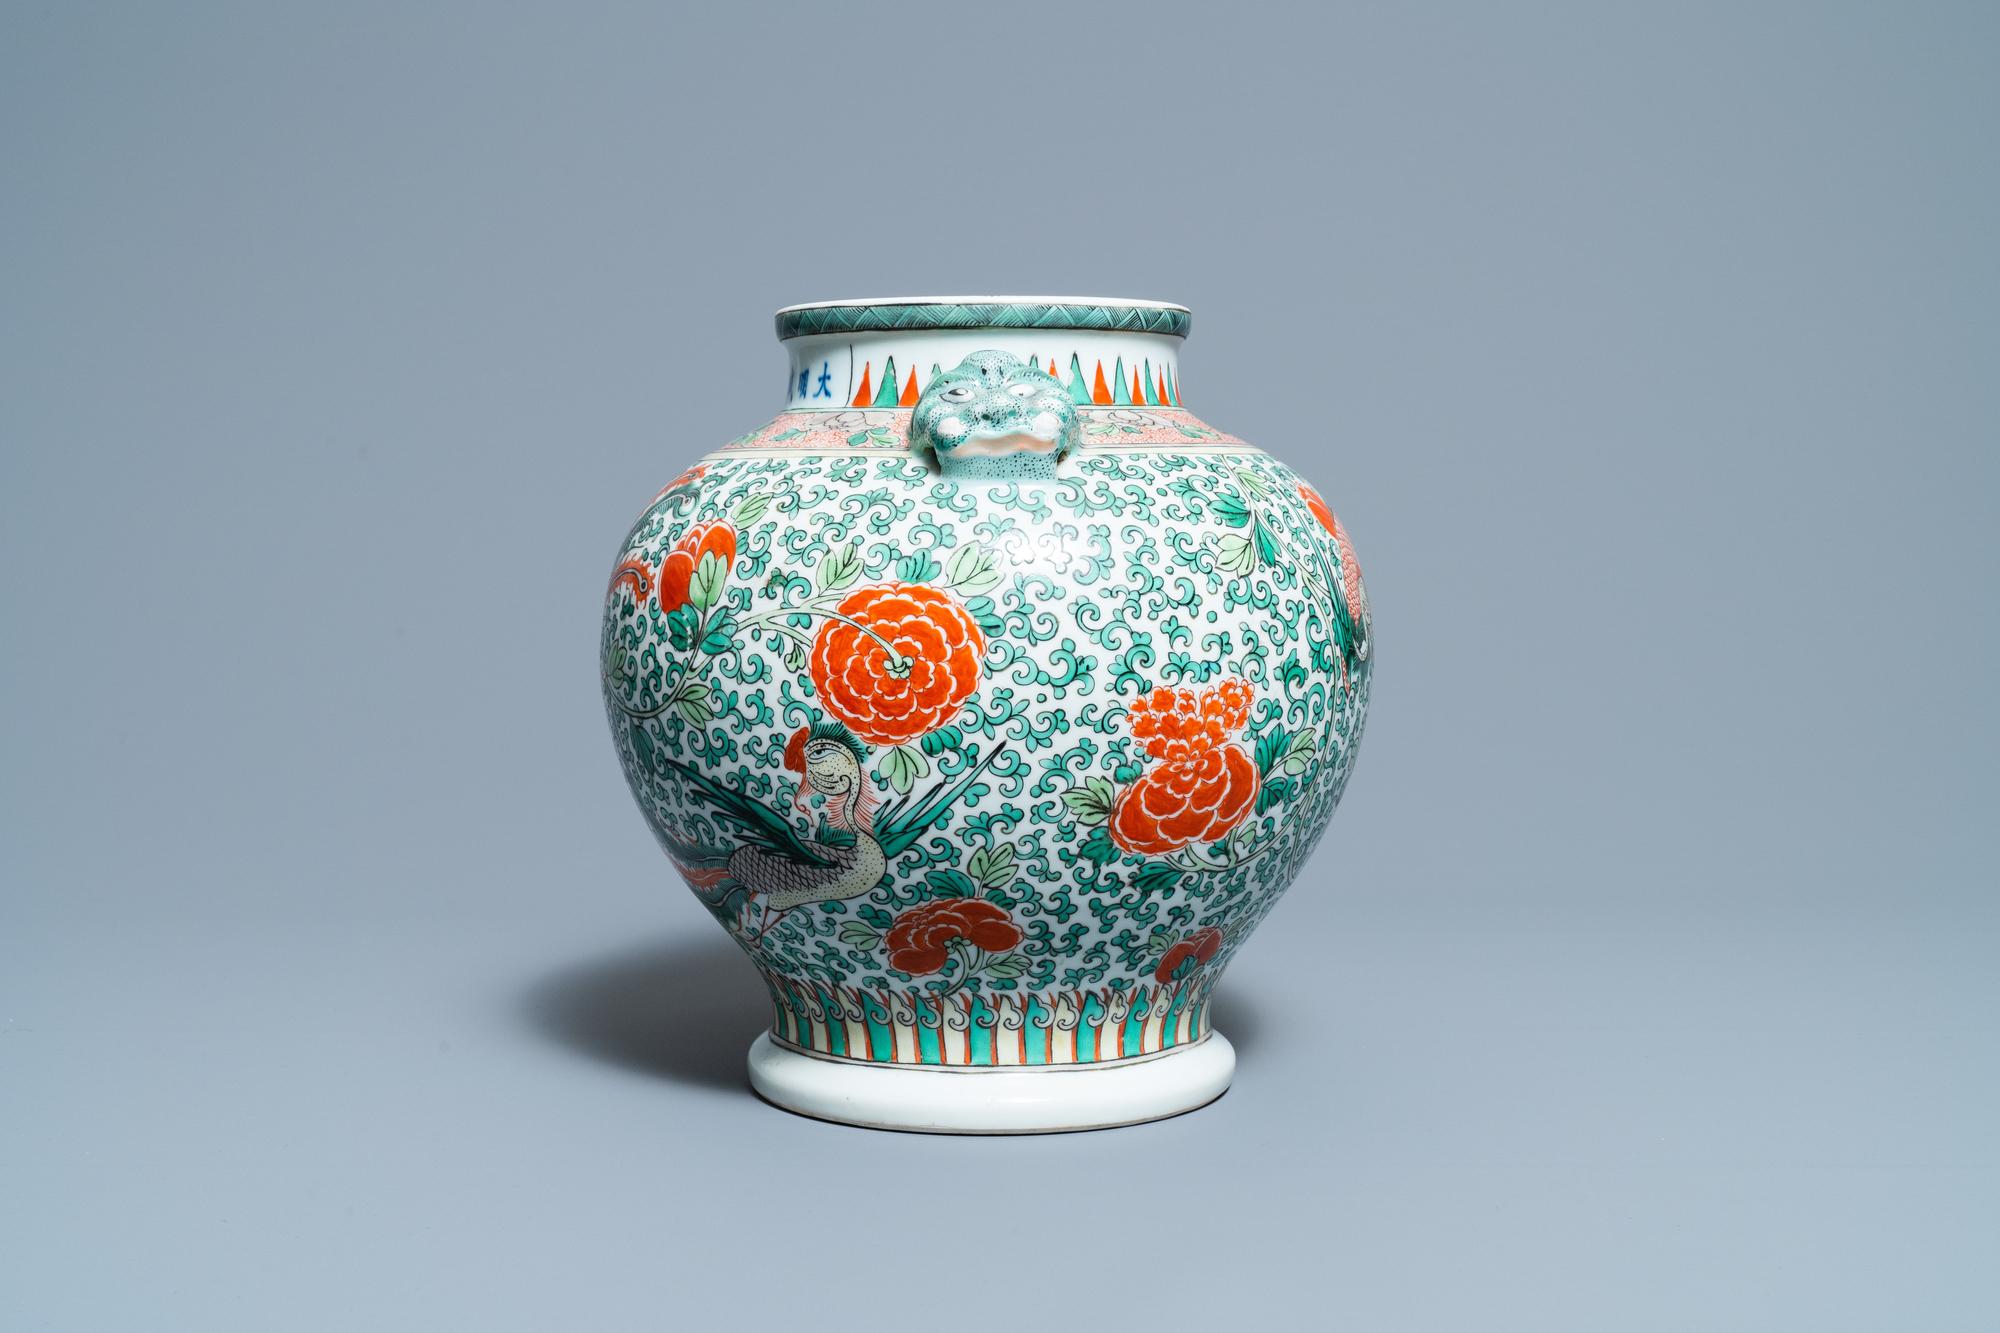 A Chinese 'wucai' phoenix vase, Chenghua mark, 19th C. - Image 2 of 6